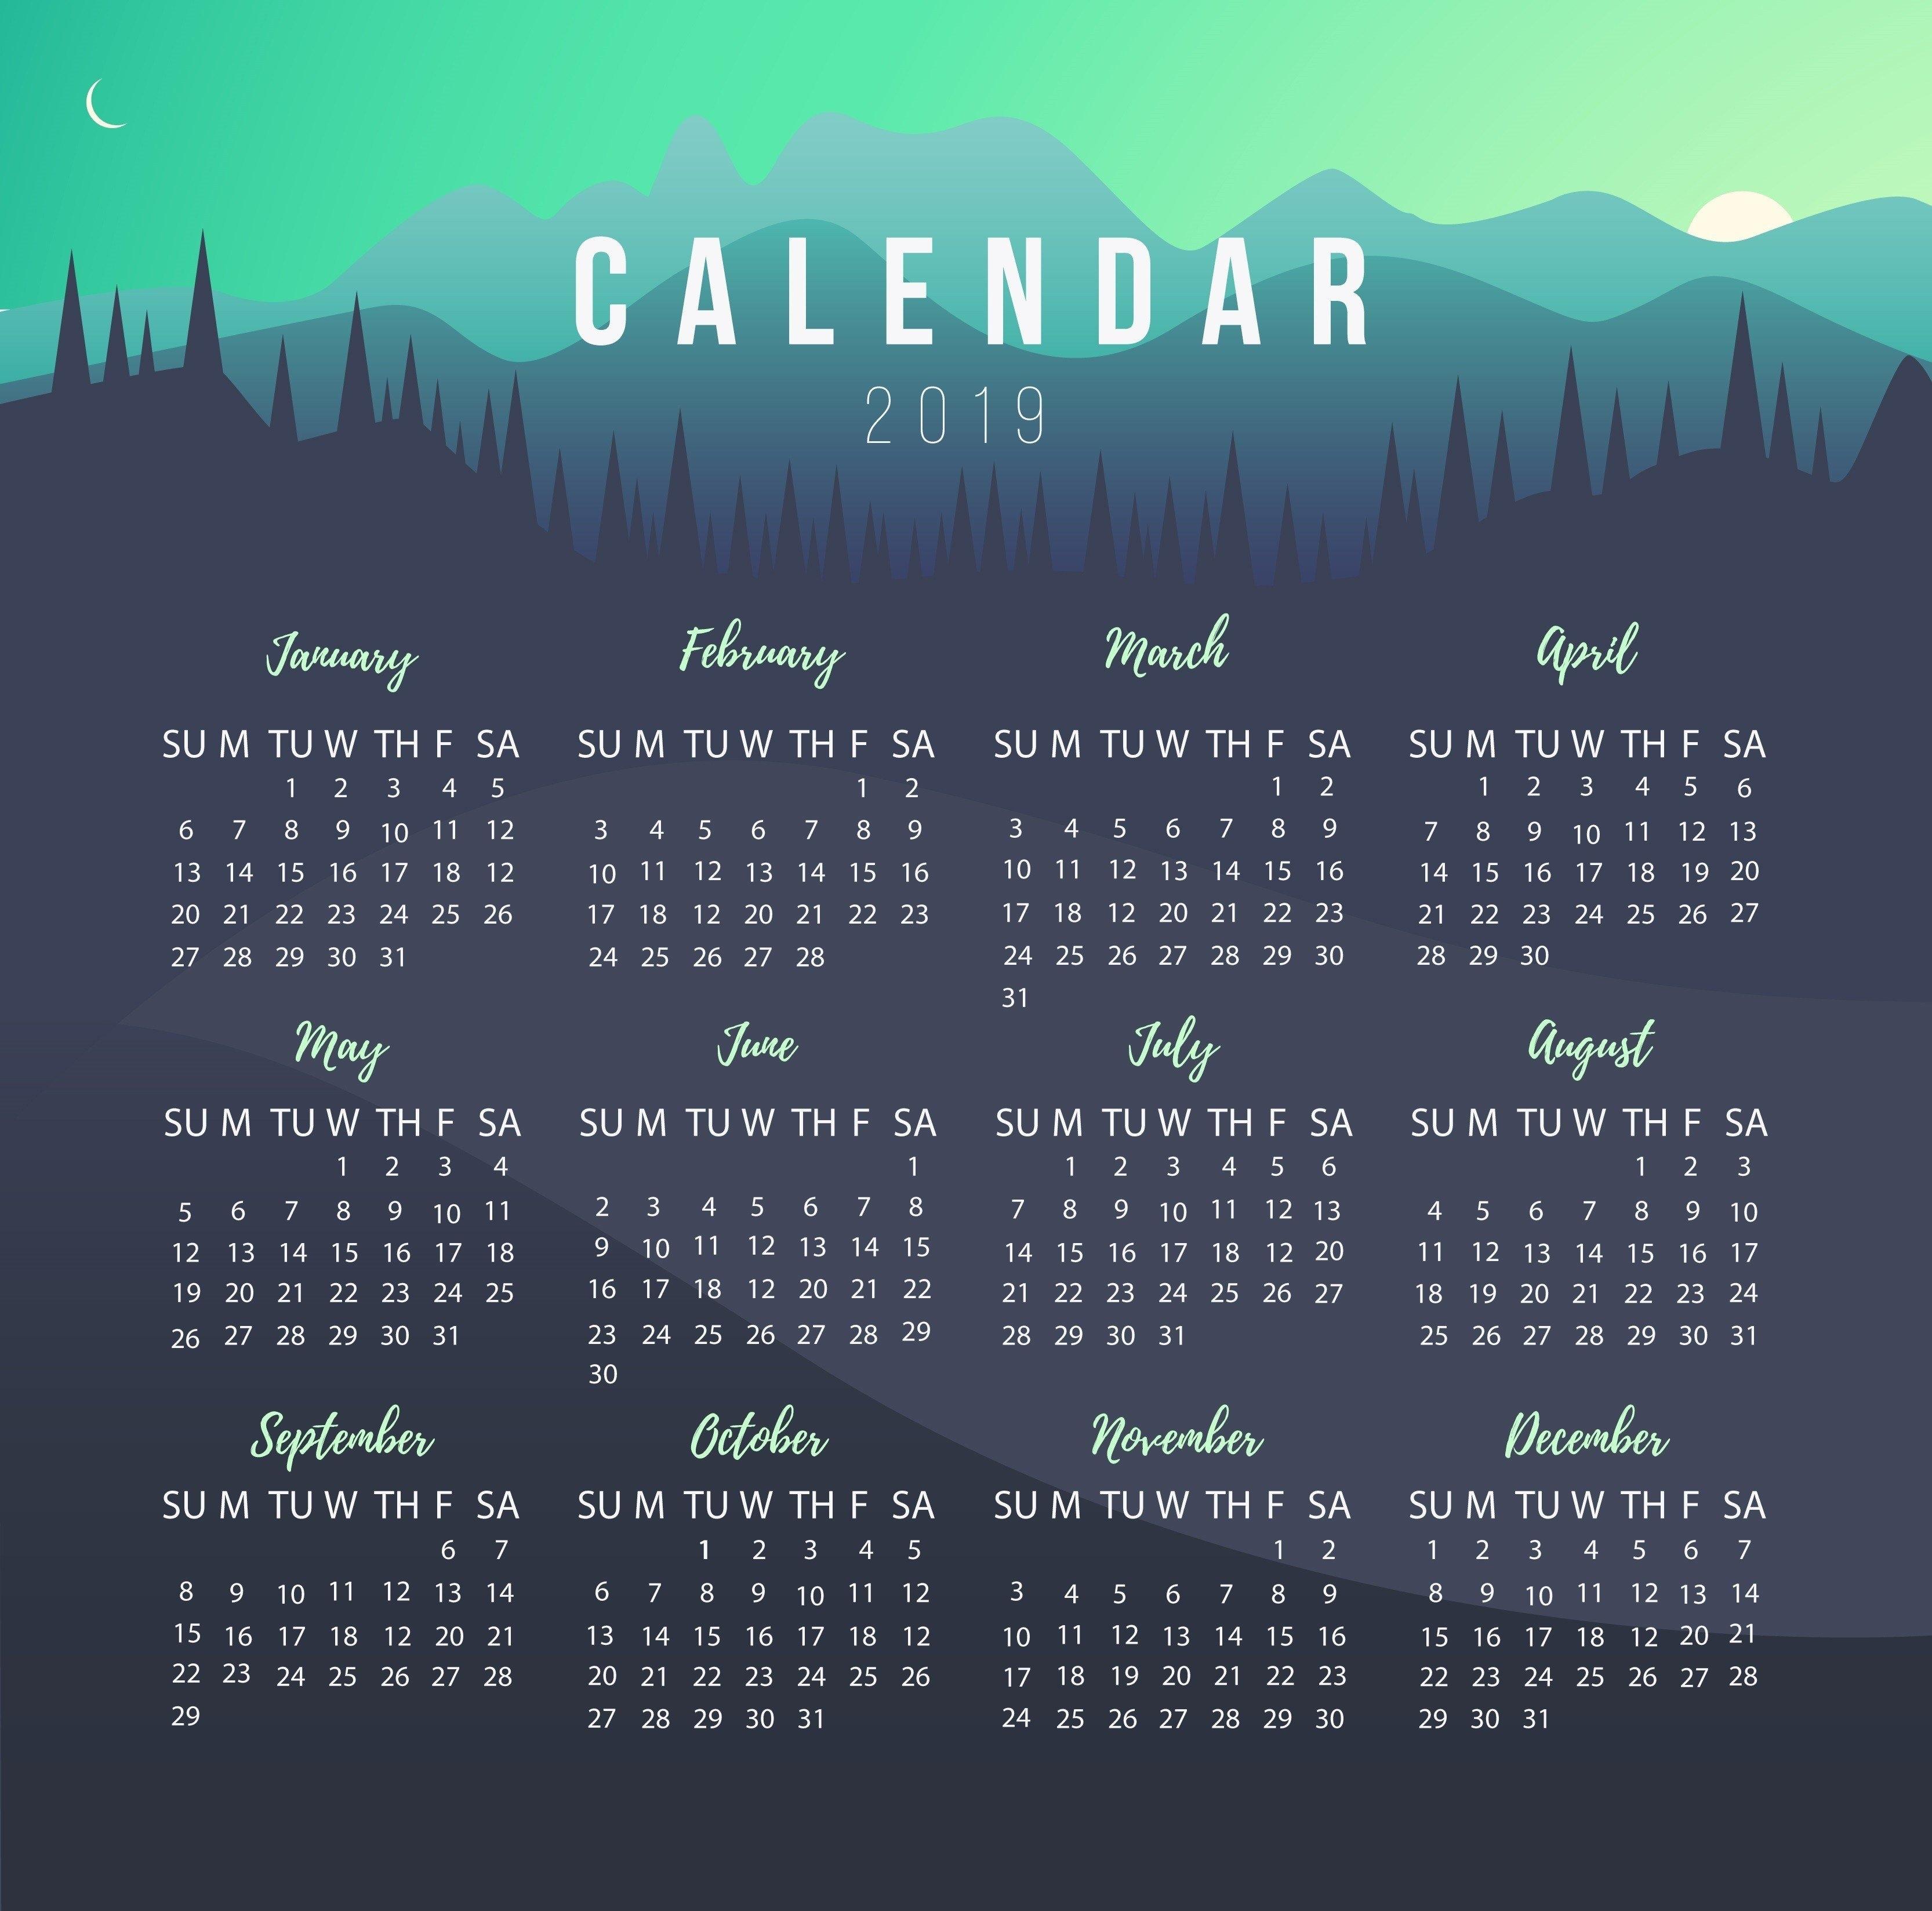 Calendar Maker In The Philippines   Dotph The Official Domain Name Calendar 2019 Maker